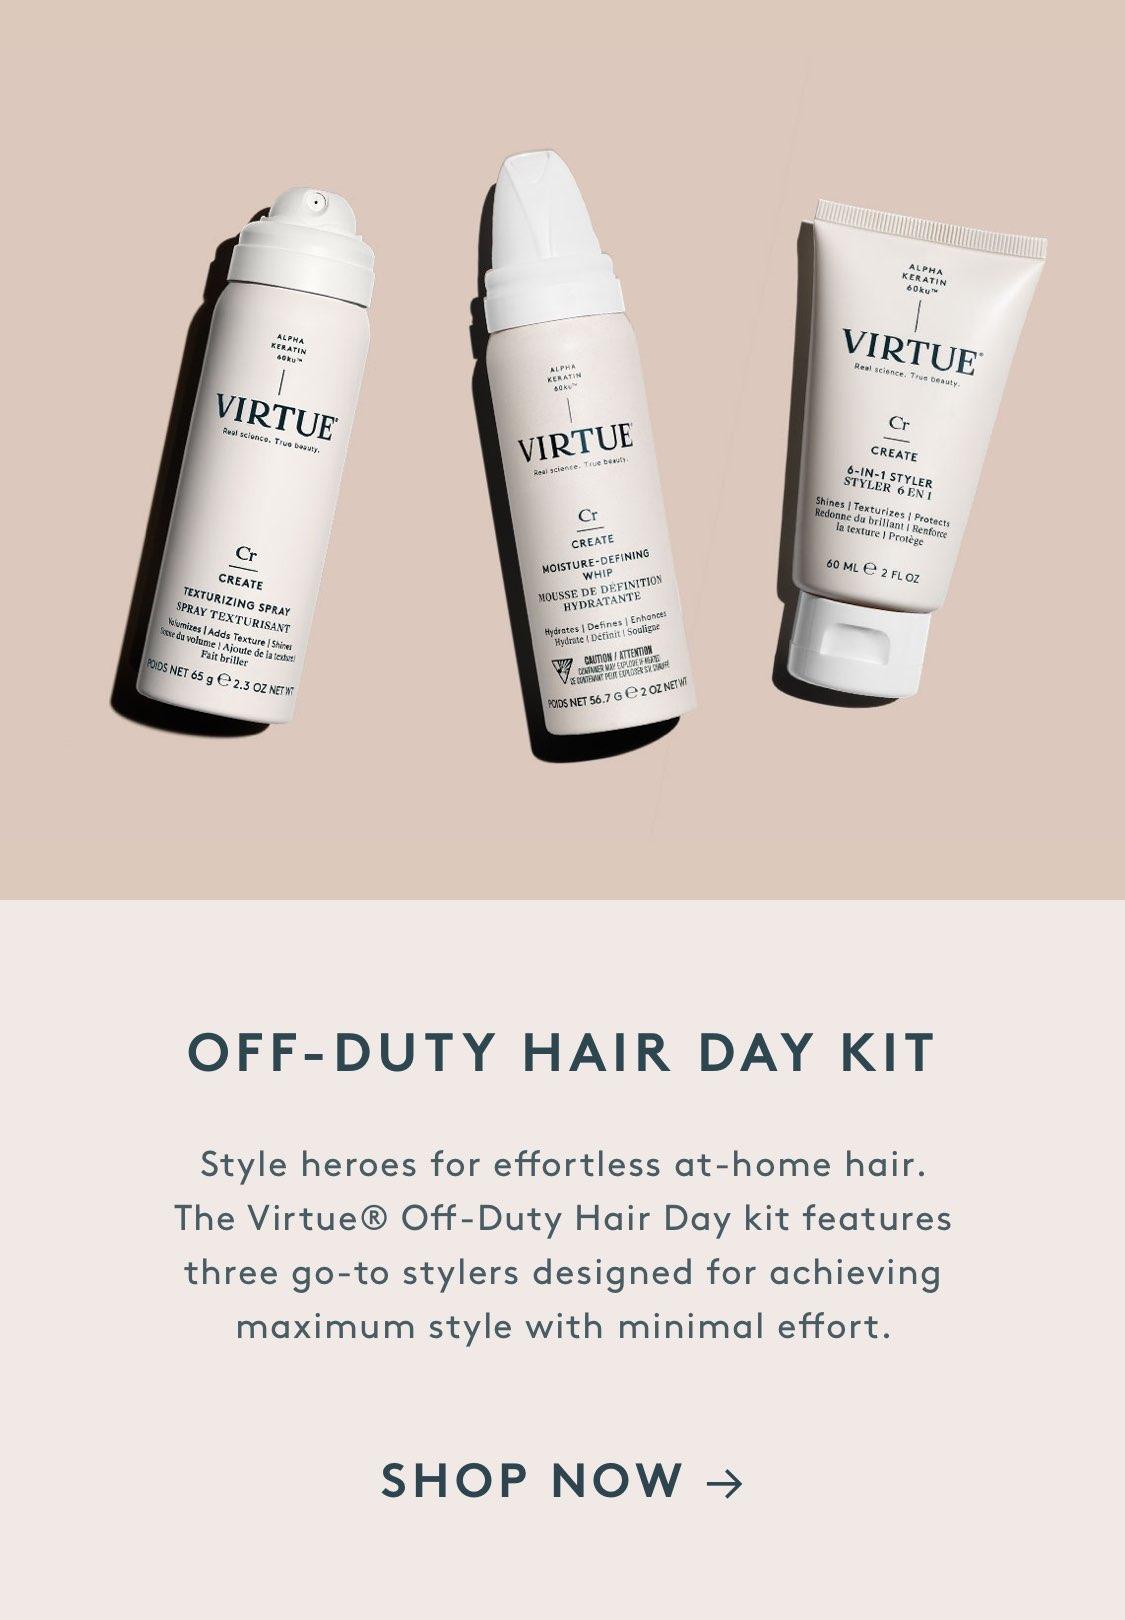 Off-Duty Hair Day Kit